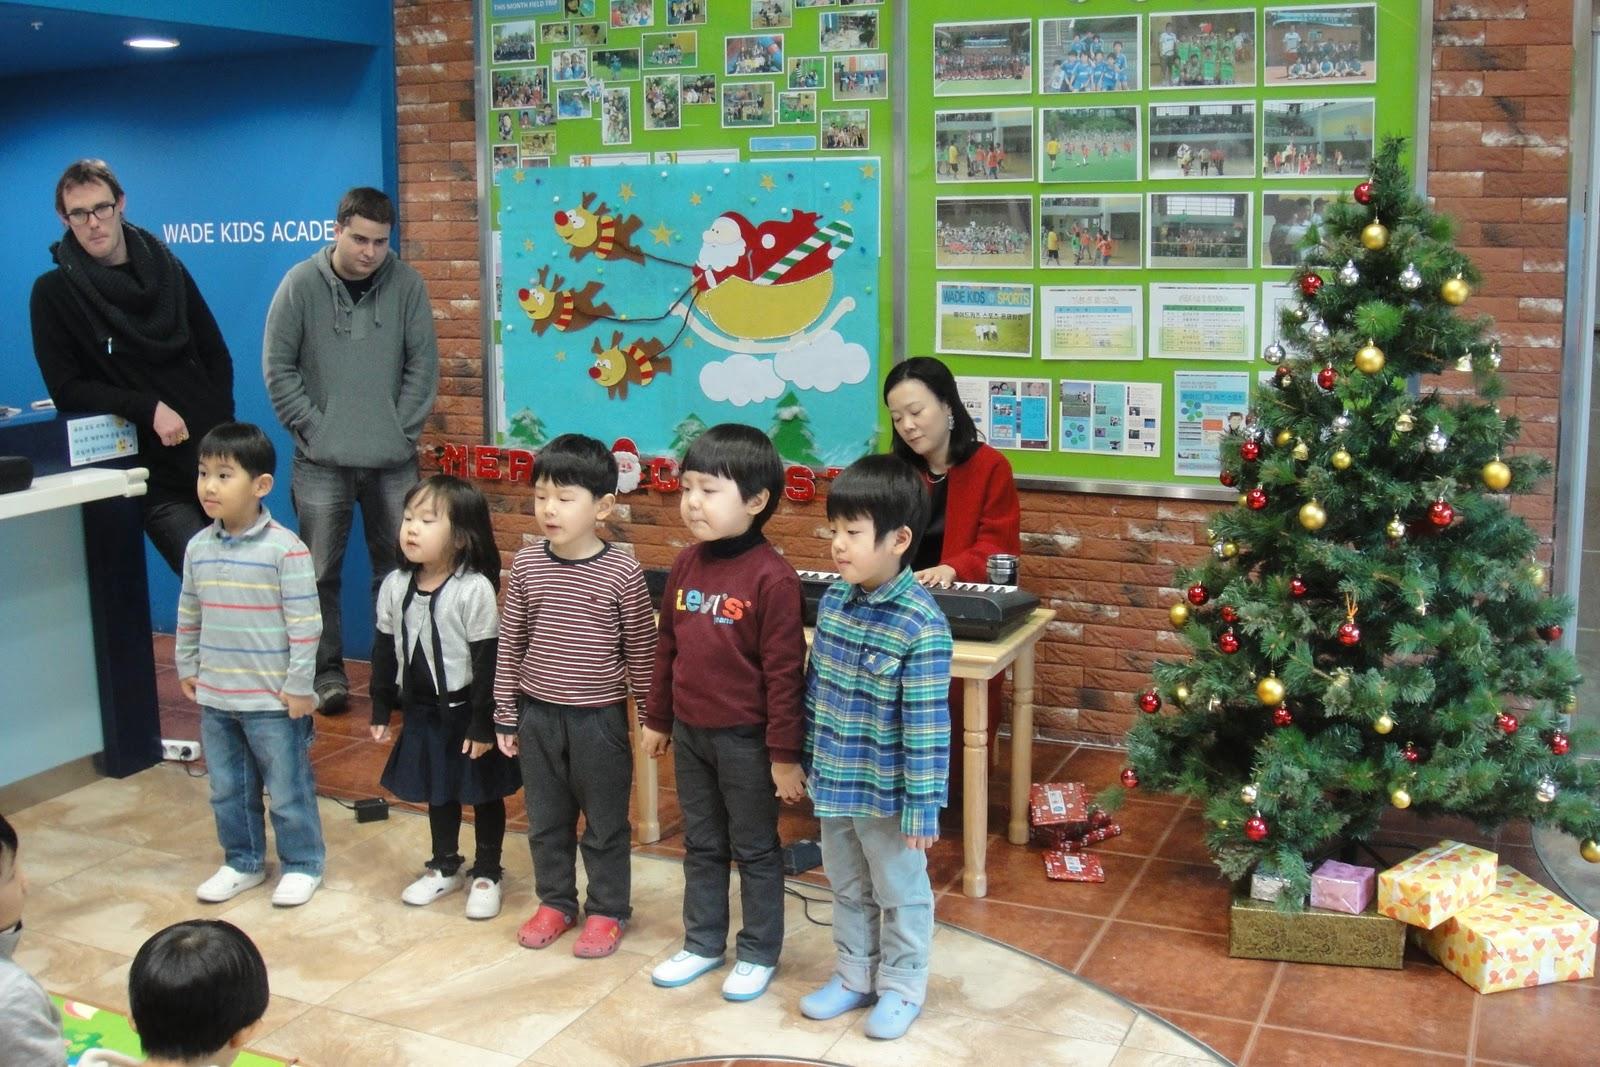 Not Just Kimchi: Wade Kids Academy Celebrates Christmas